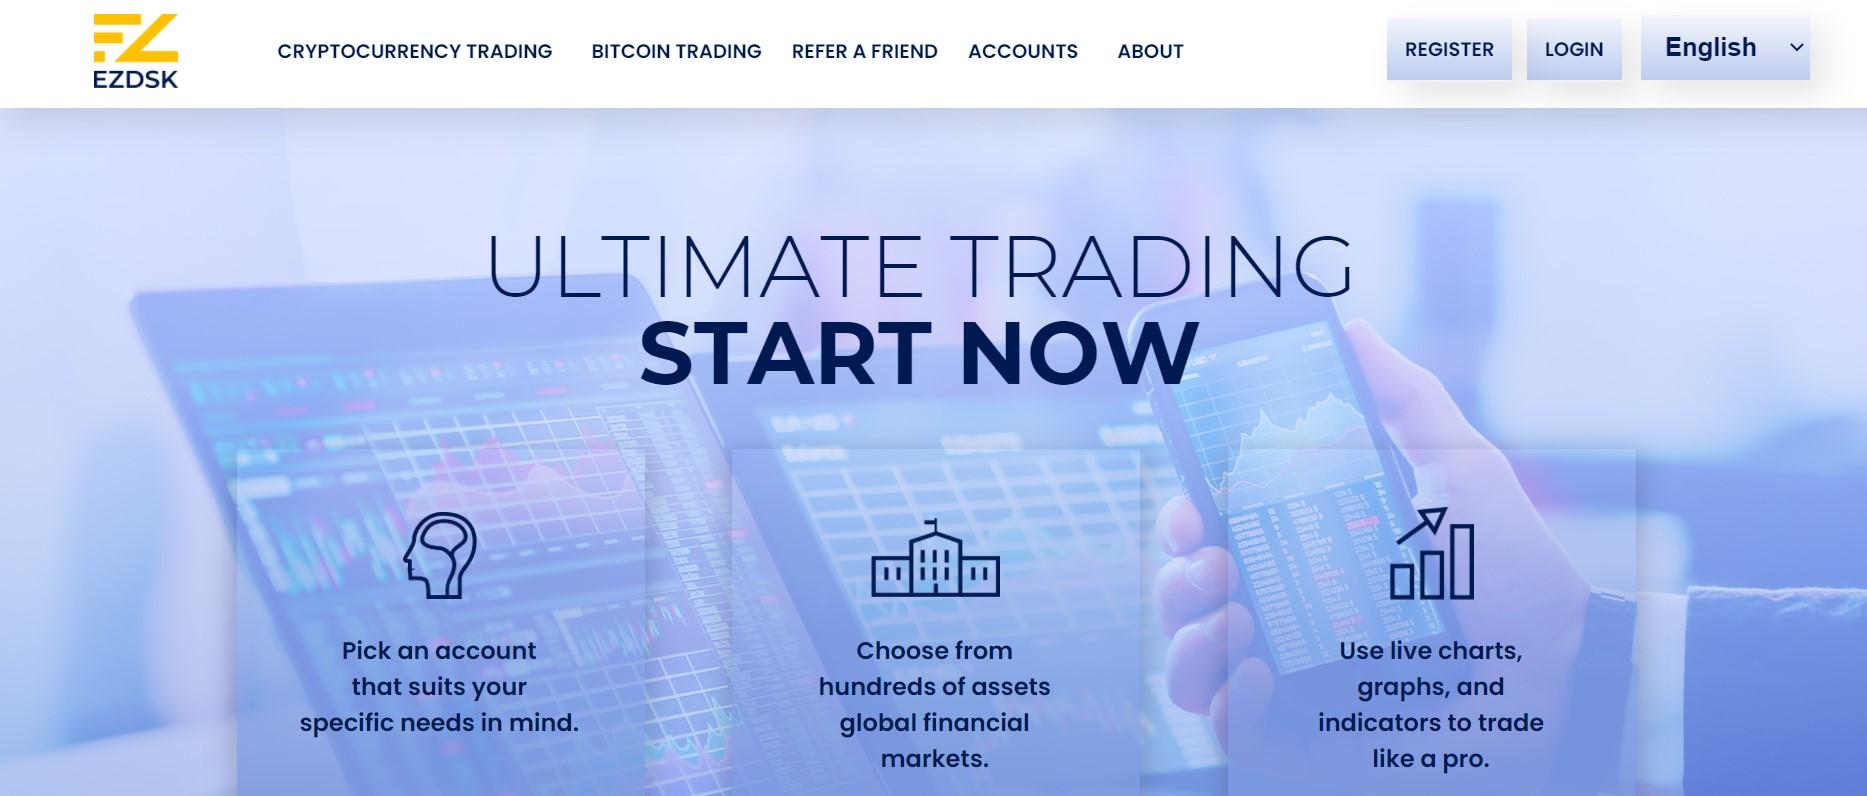 EZDSK website